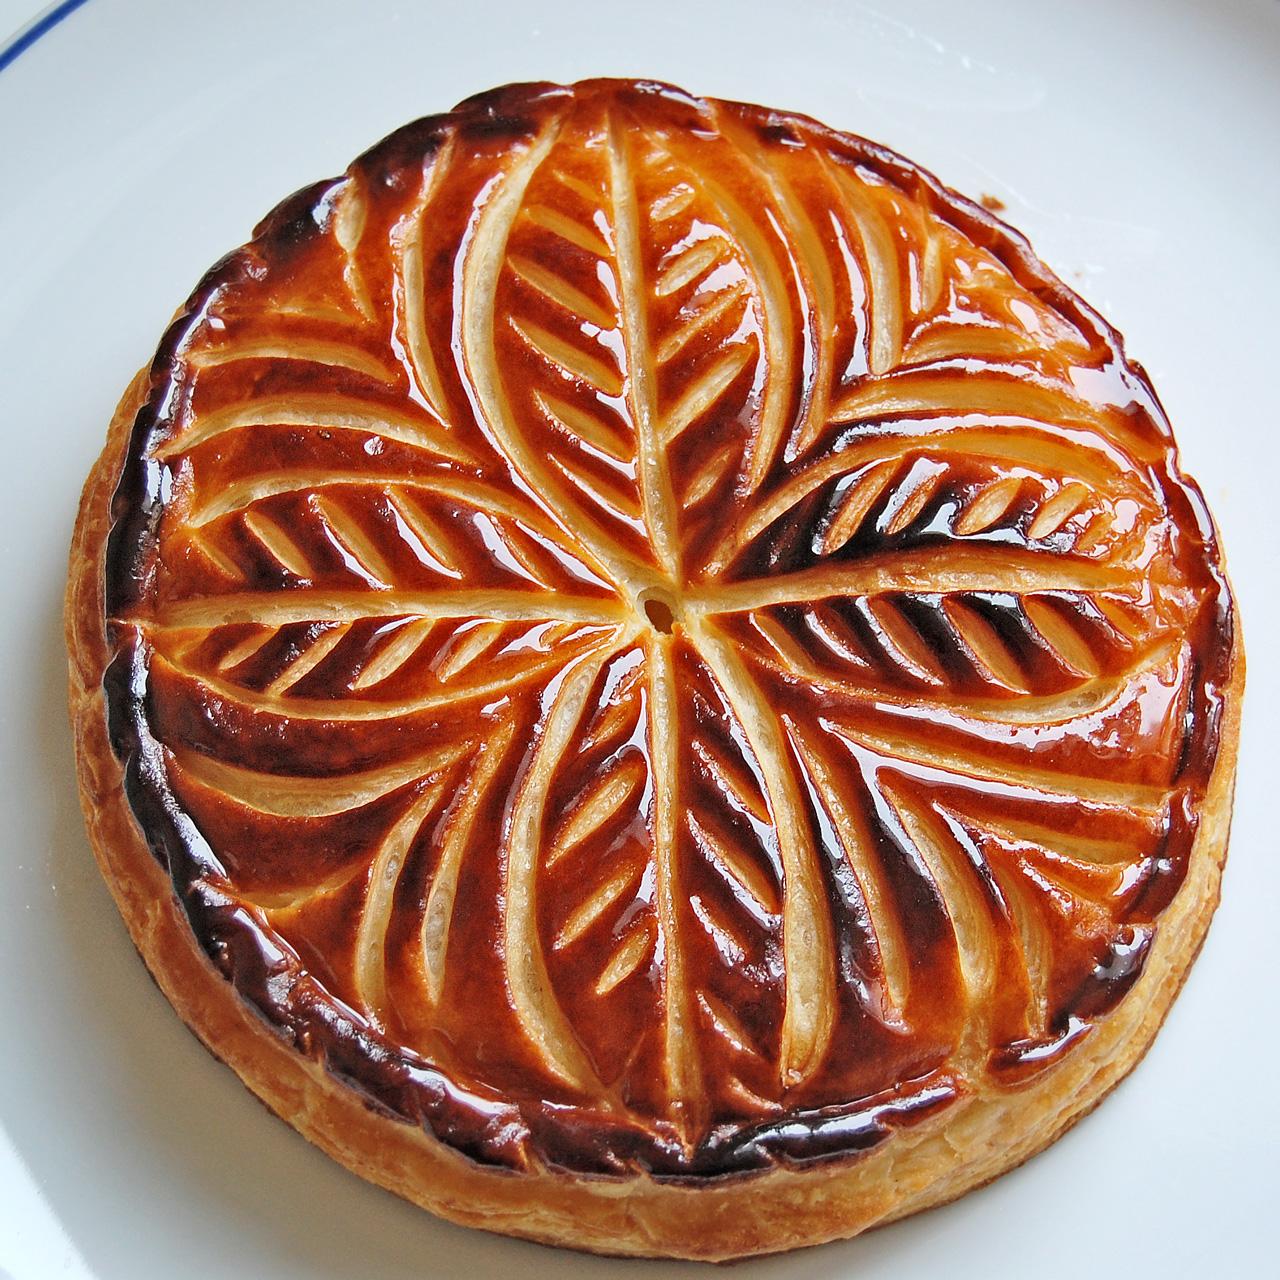 French Apple Almond Cake Recipe